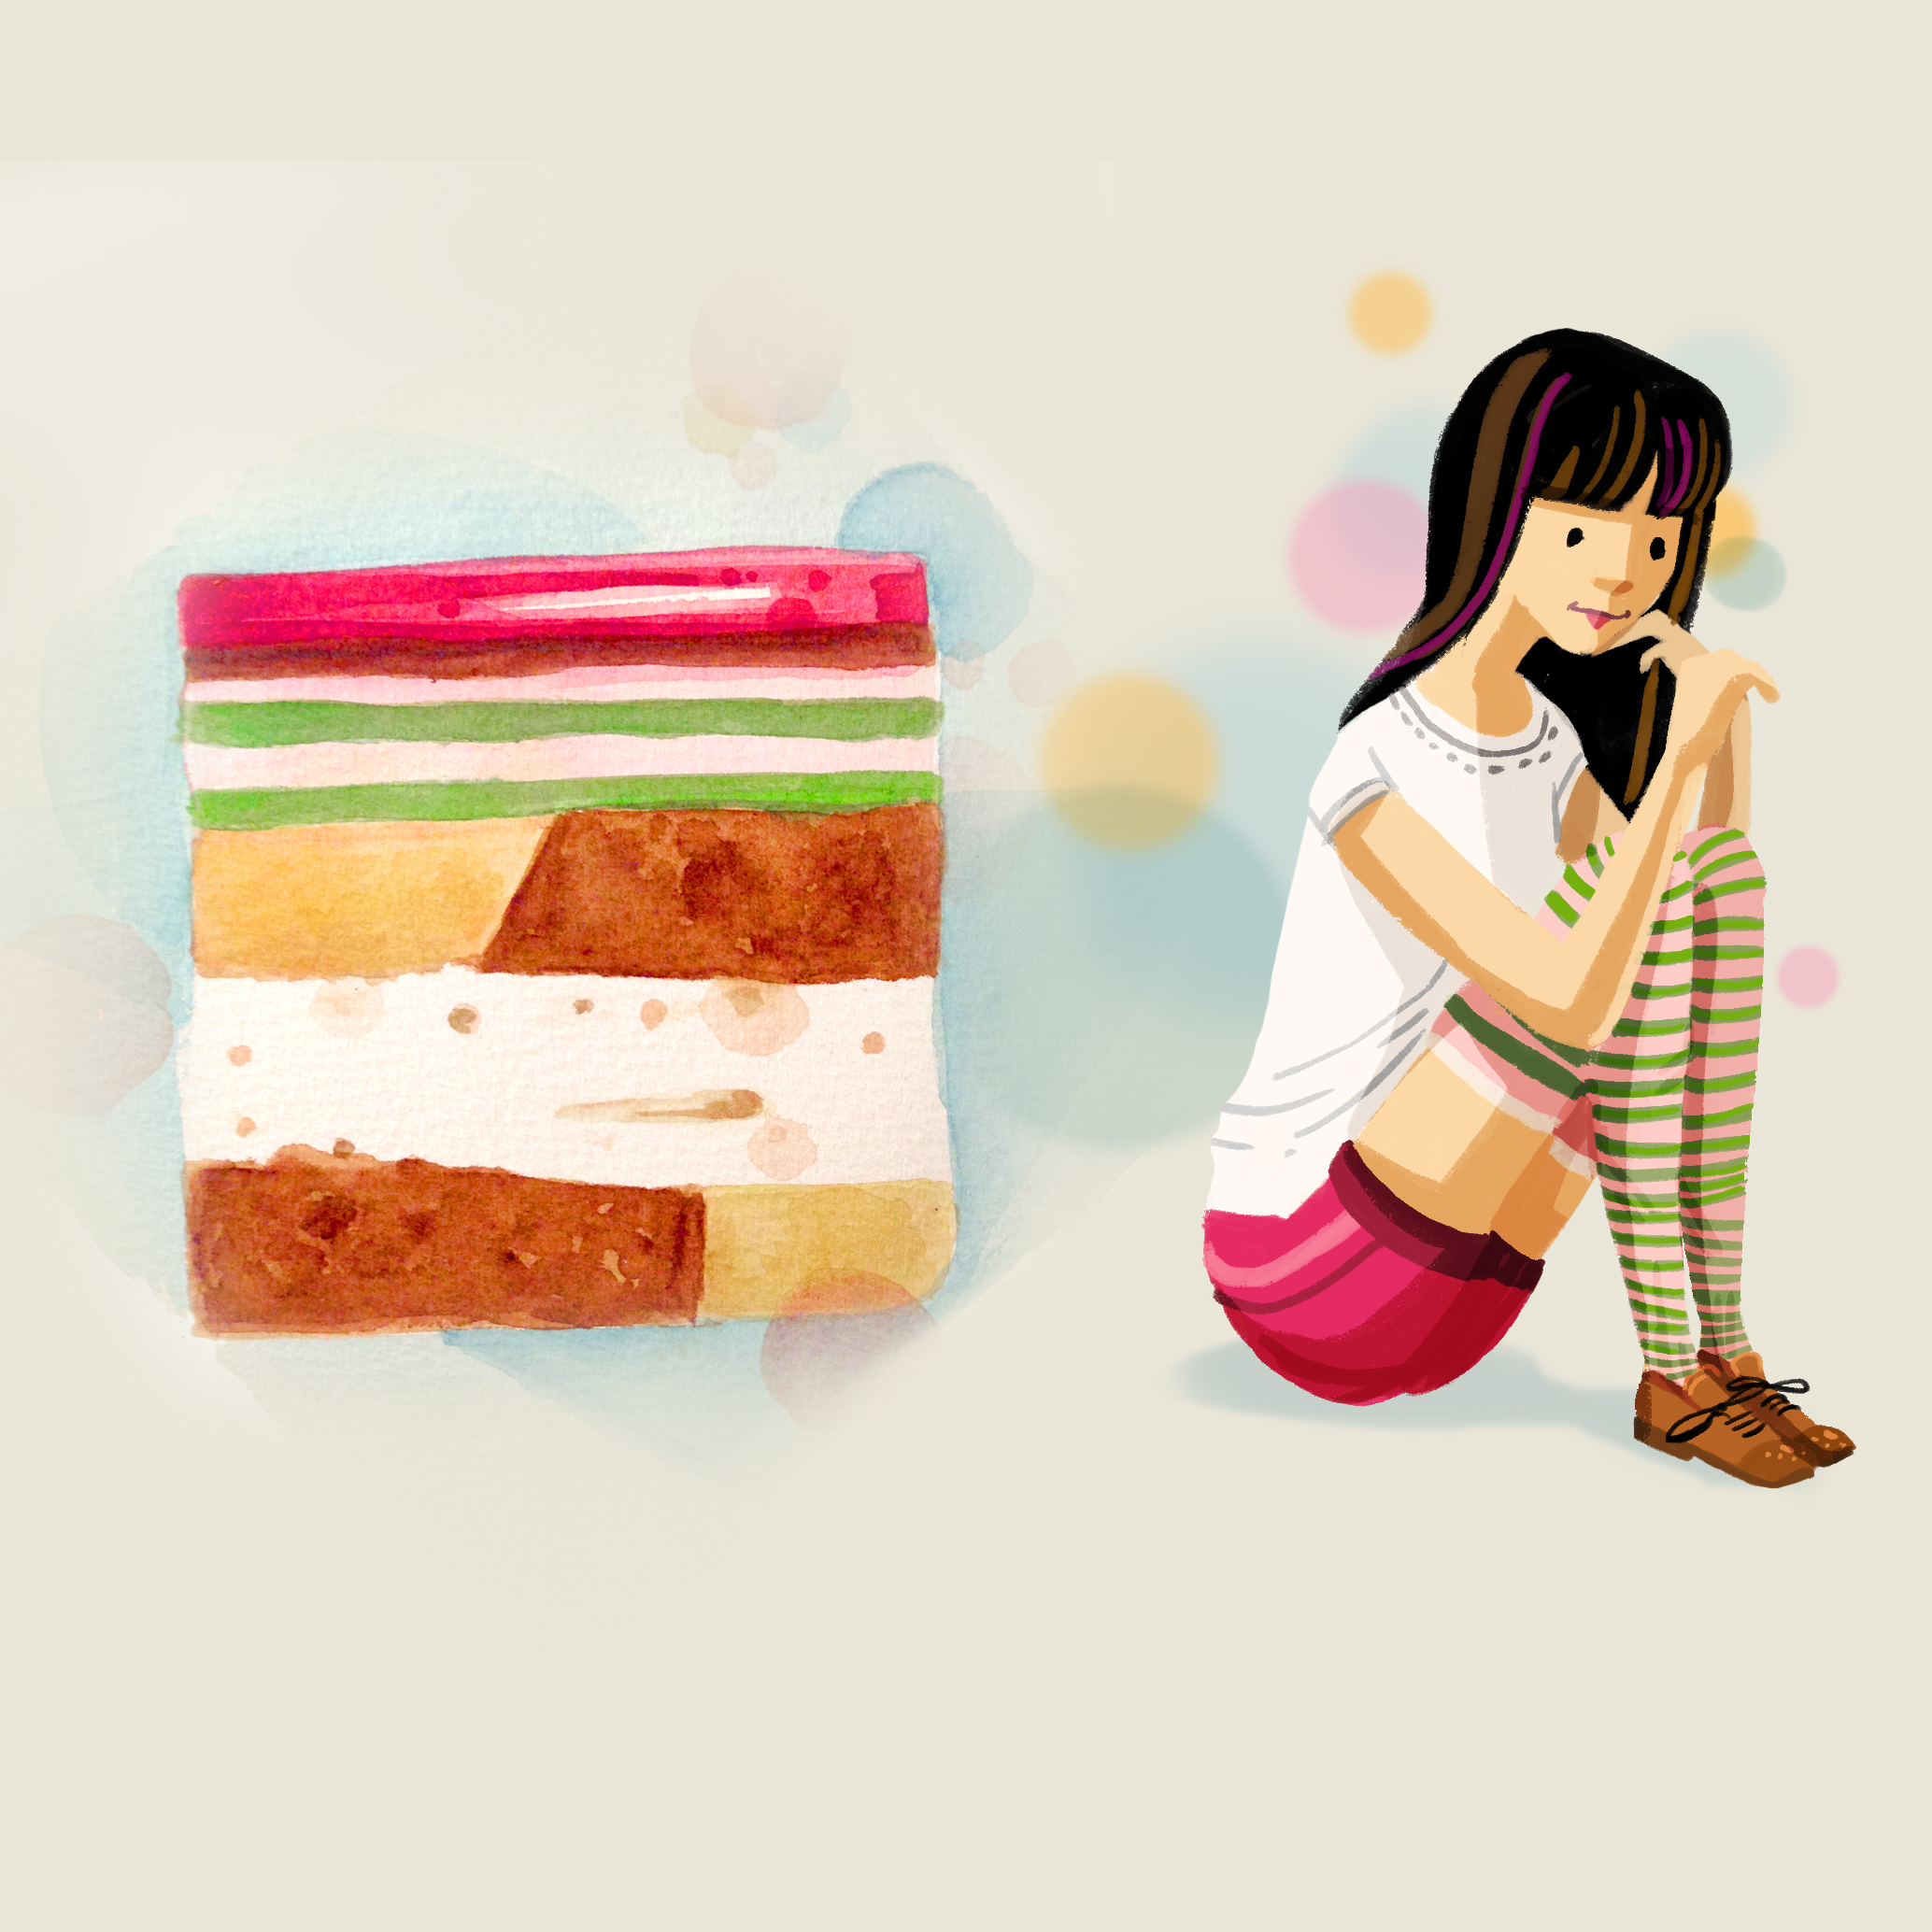 04_layer_cake_jelly.jpg